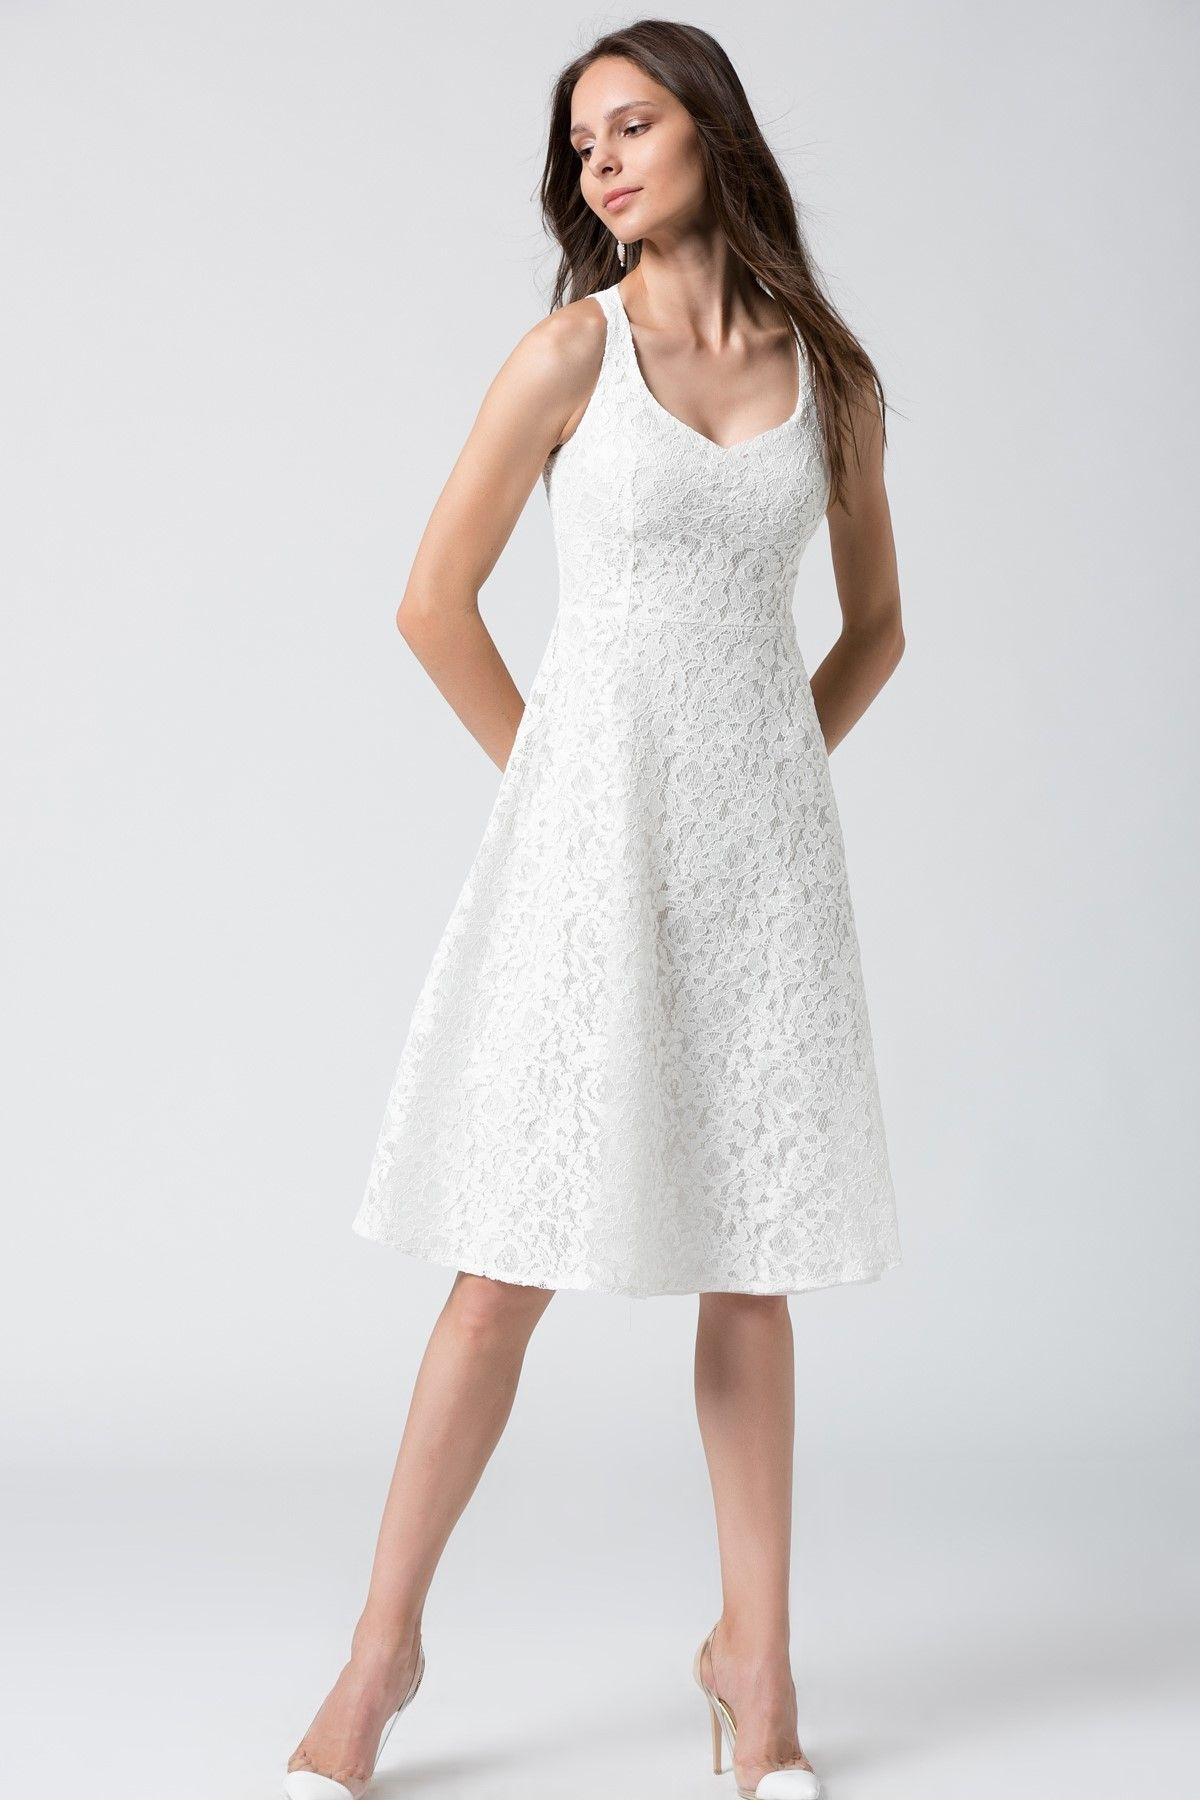 Beyaz Dantel Elbise Mlwss16fz2581 Dantel Elbise Elbise Mezuniyet Elbiseleri